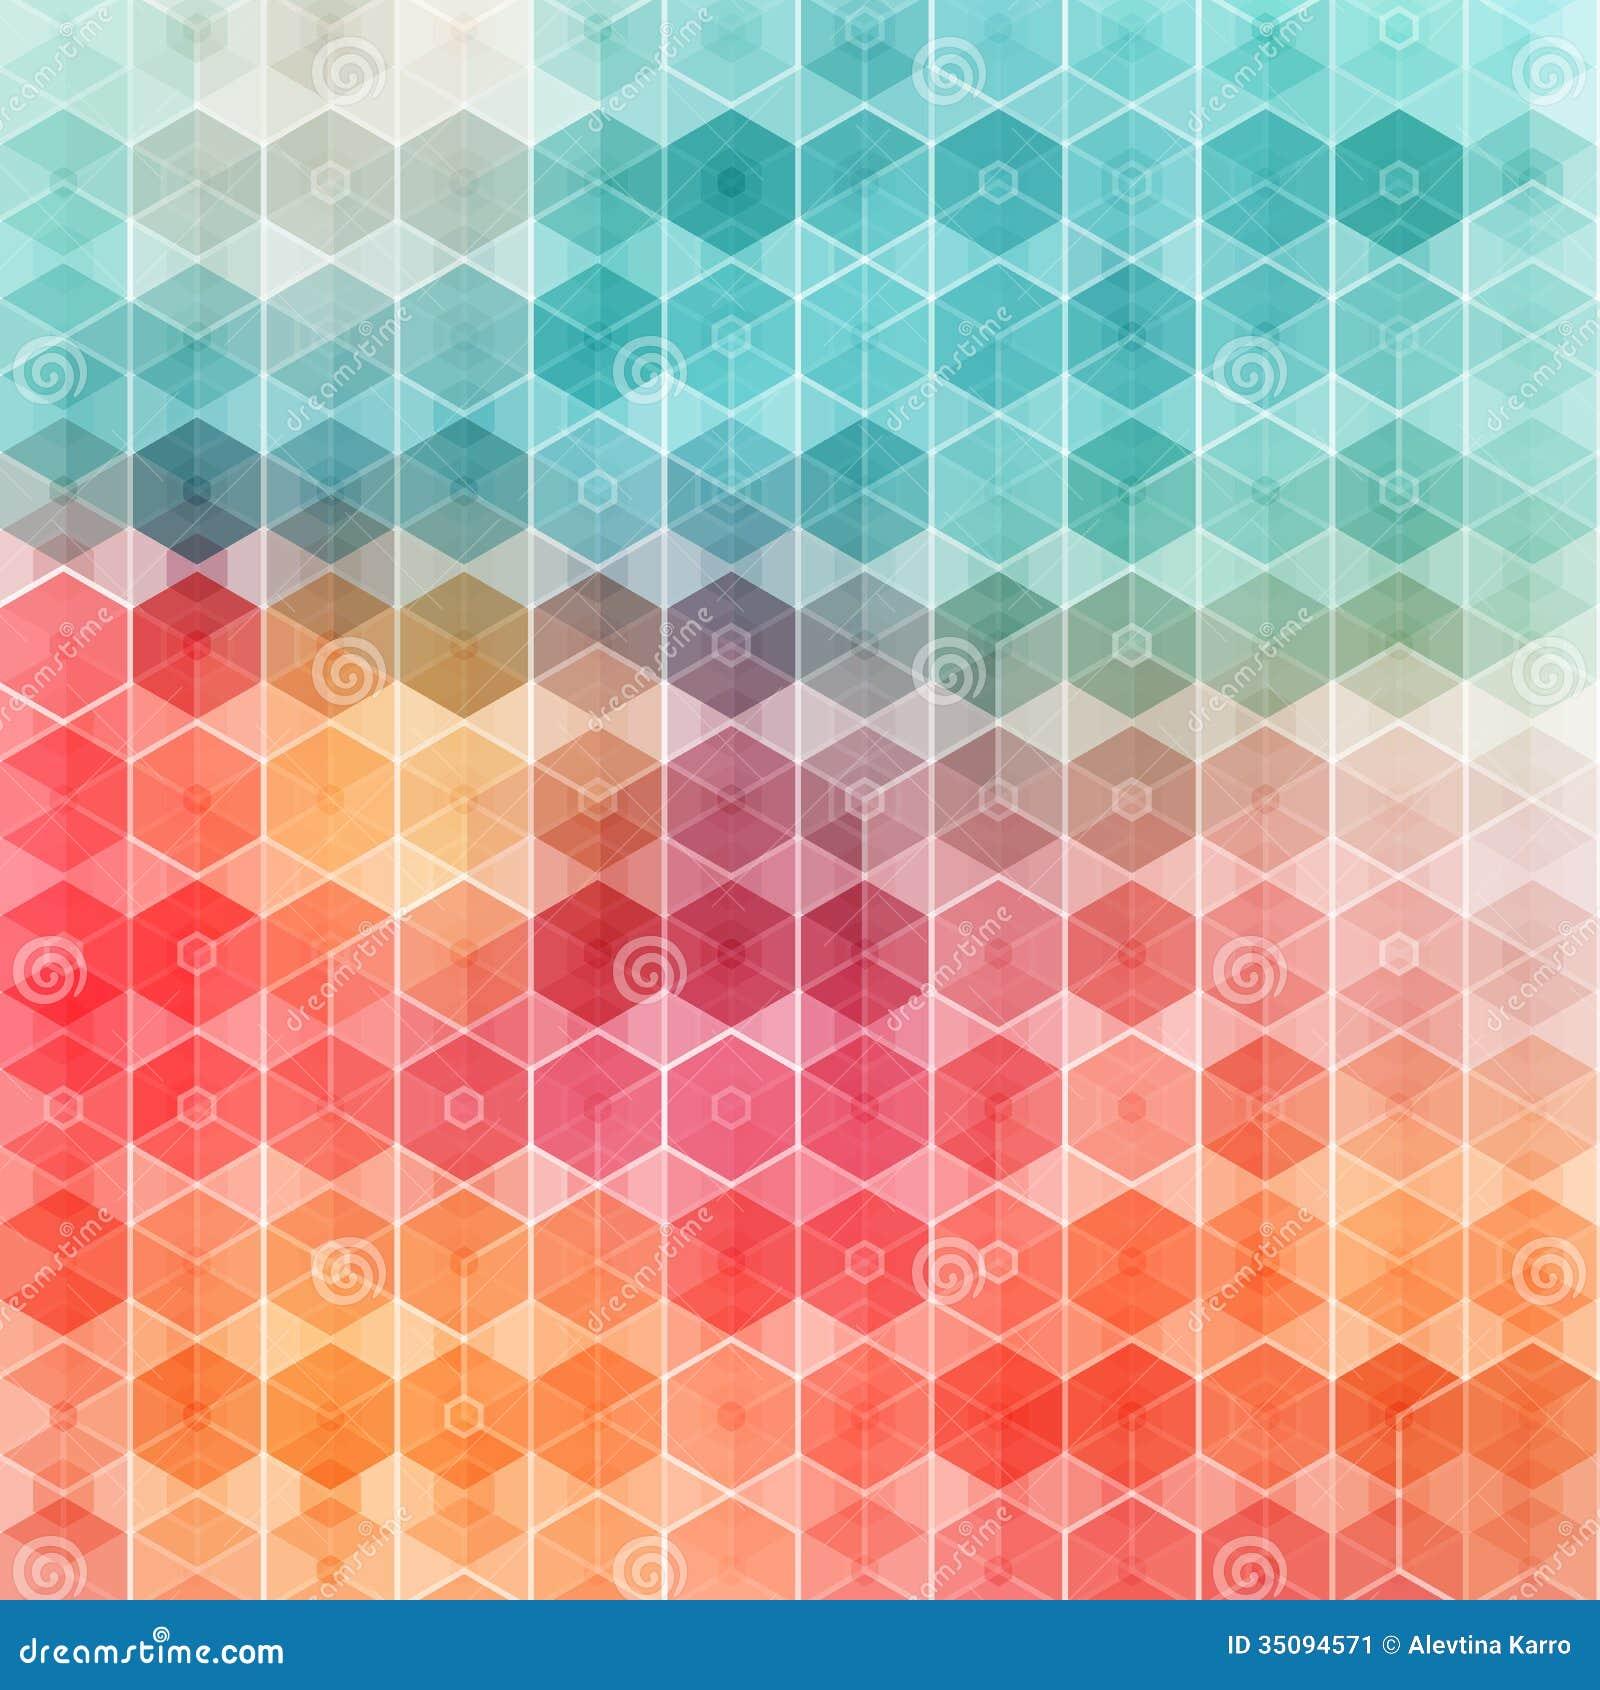 Nice en gekleurd geometrisch patroon.